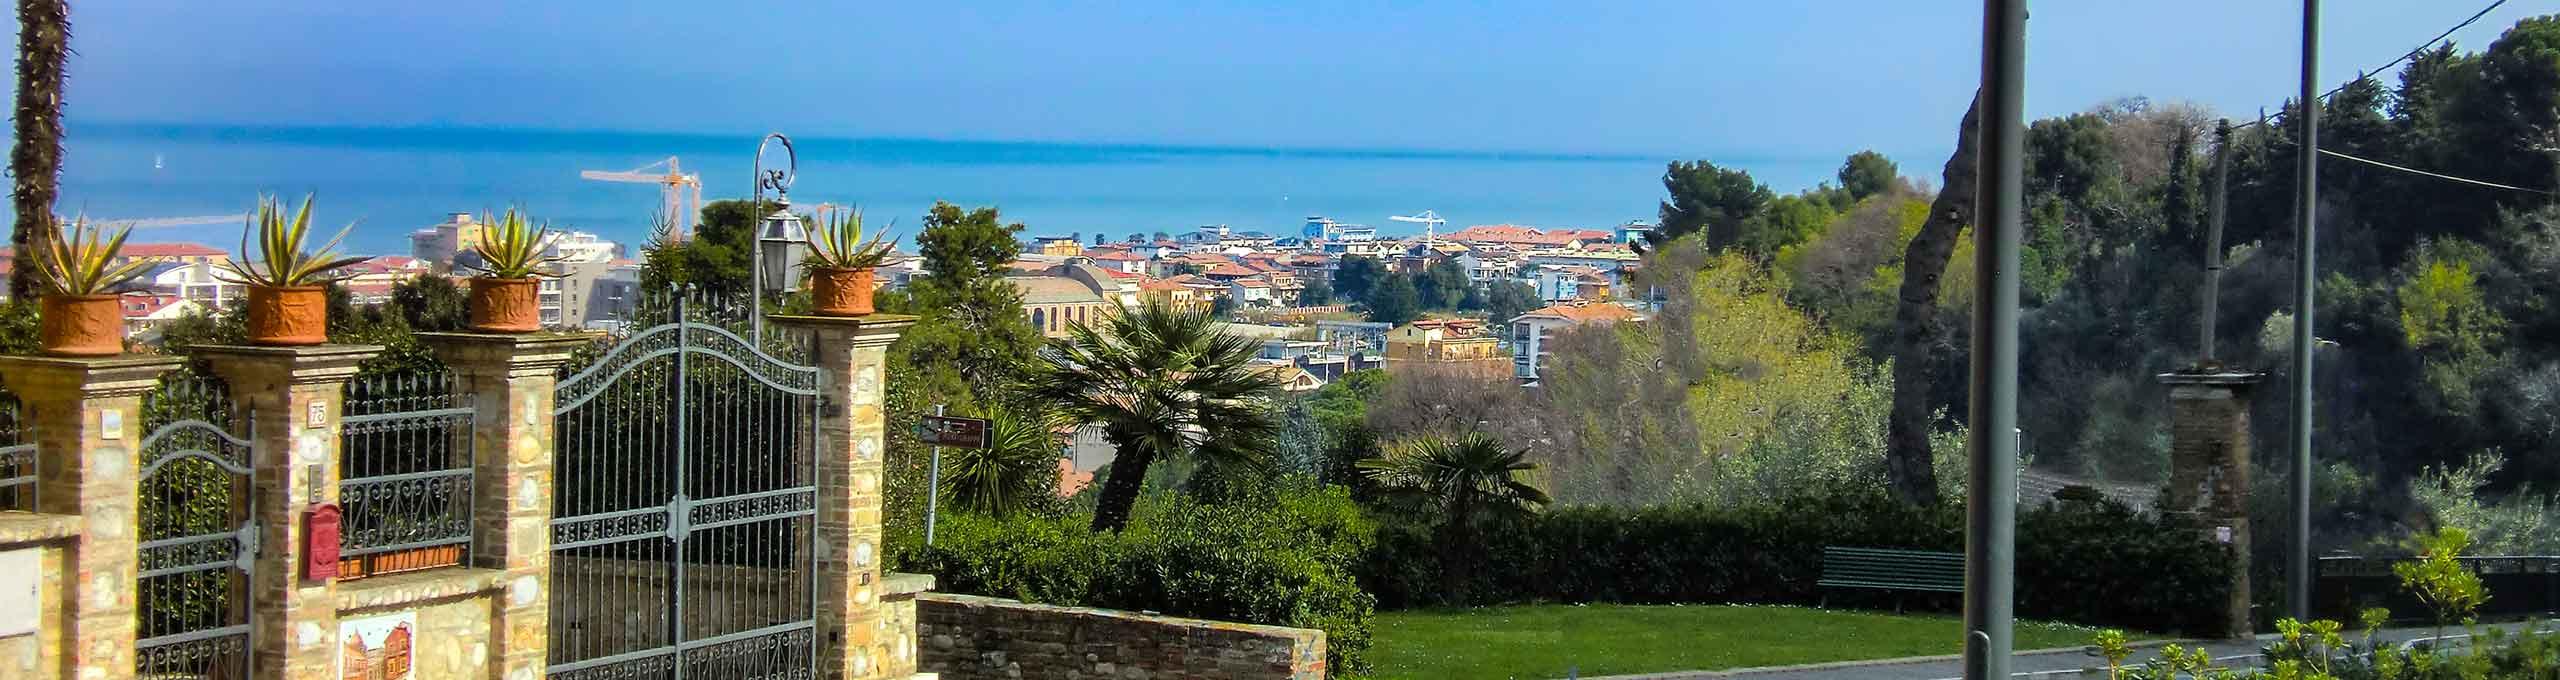 Vista Panoramica di Giulianova